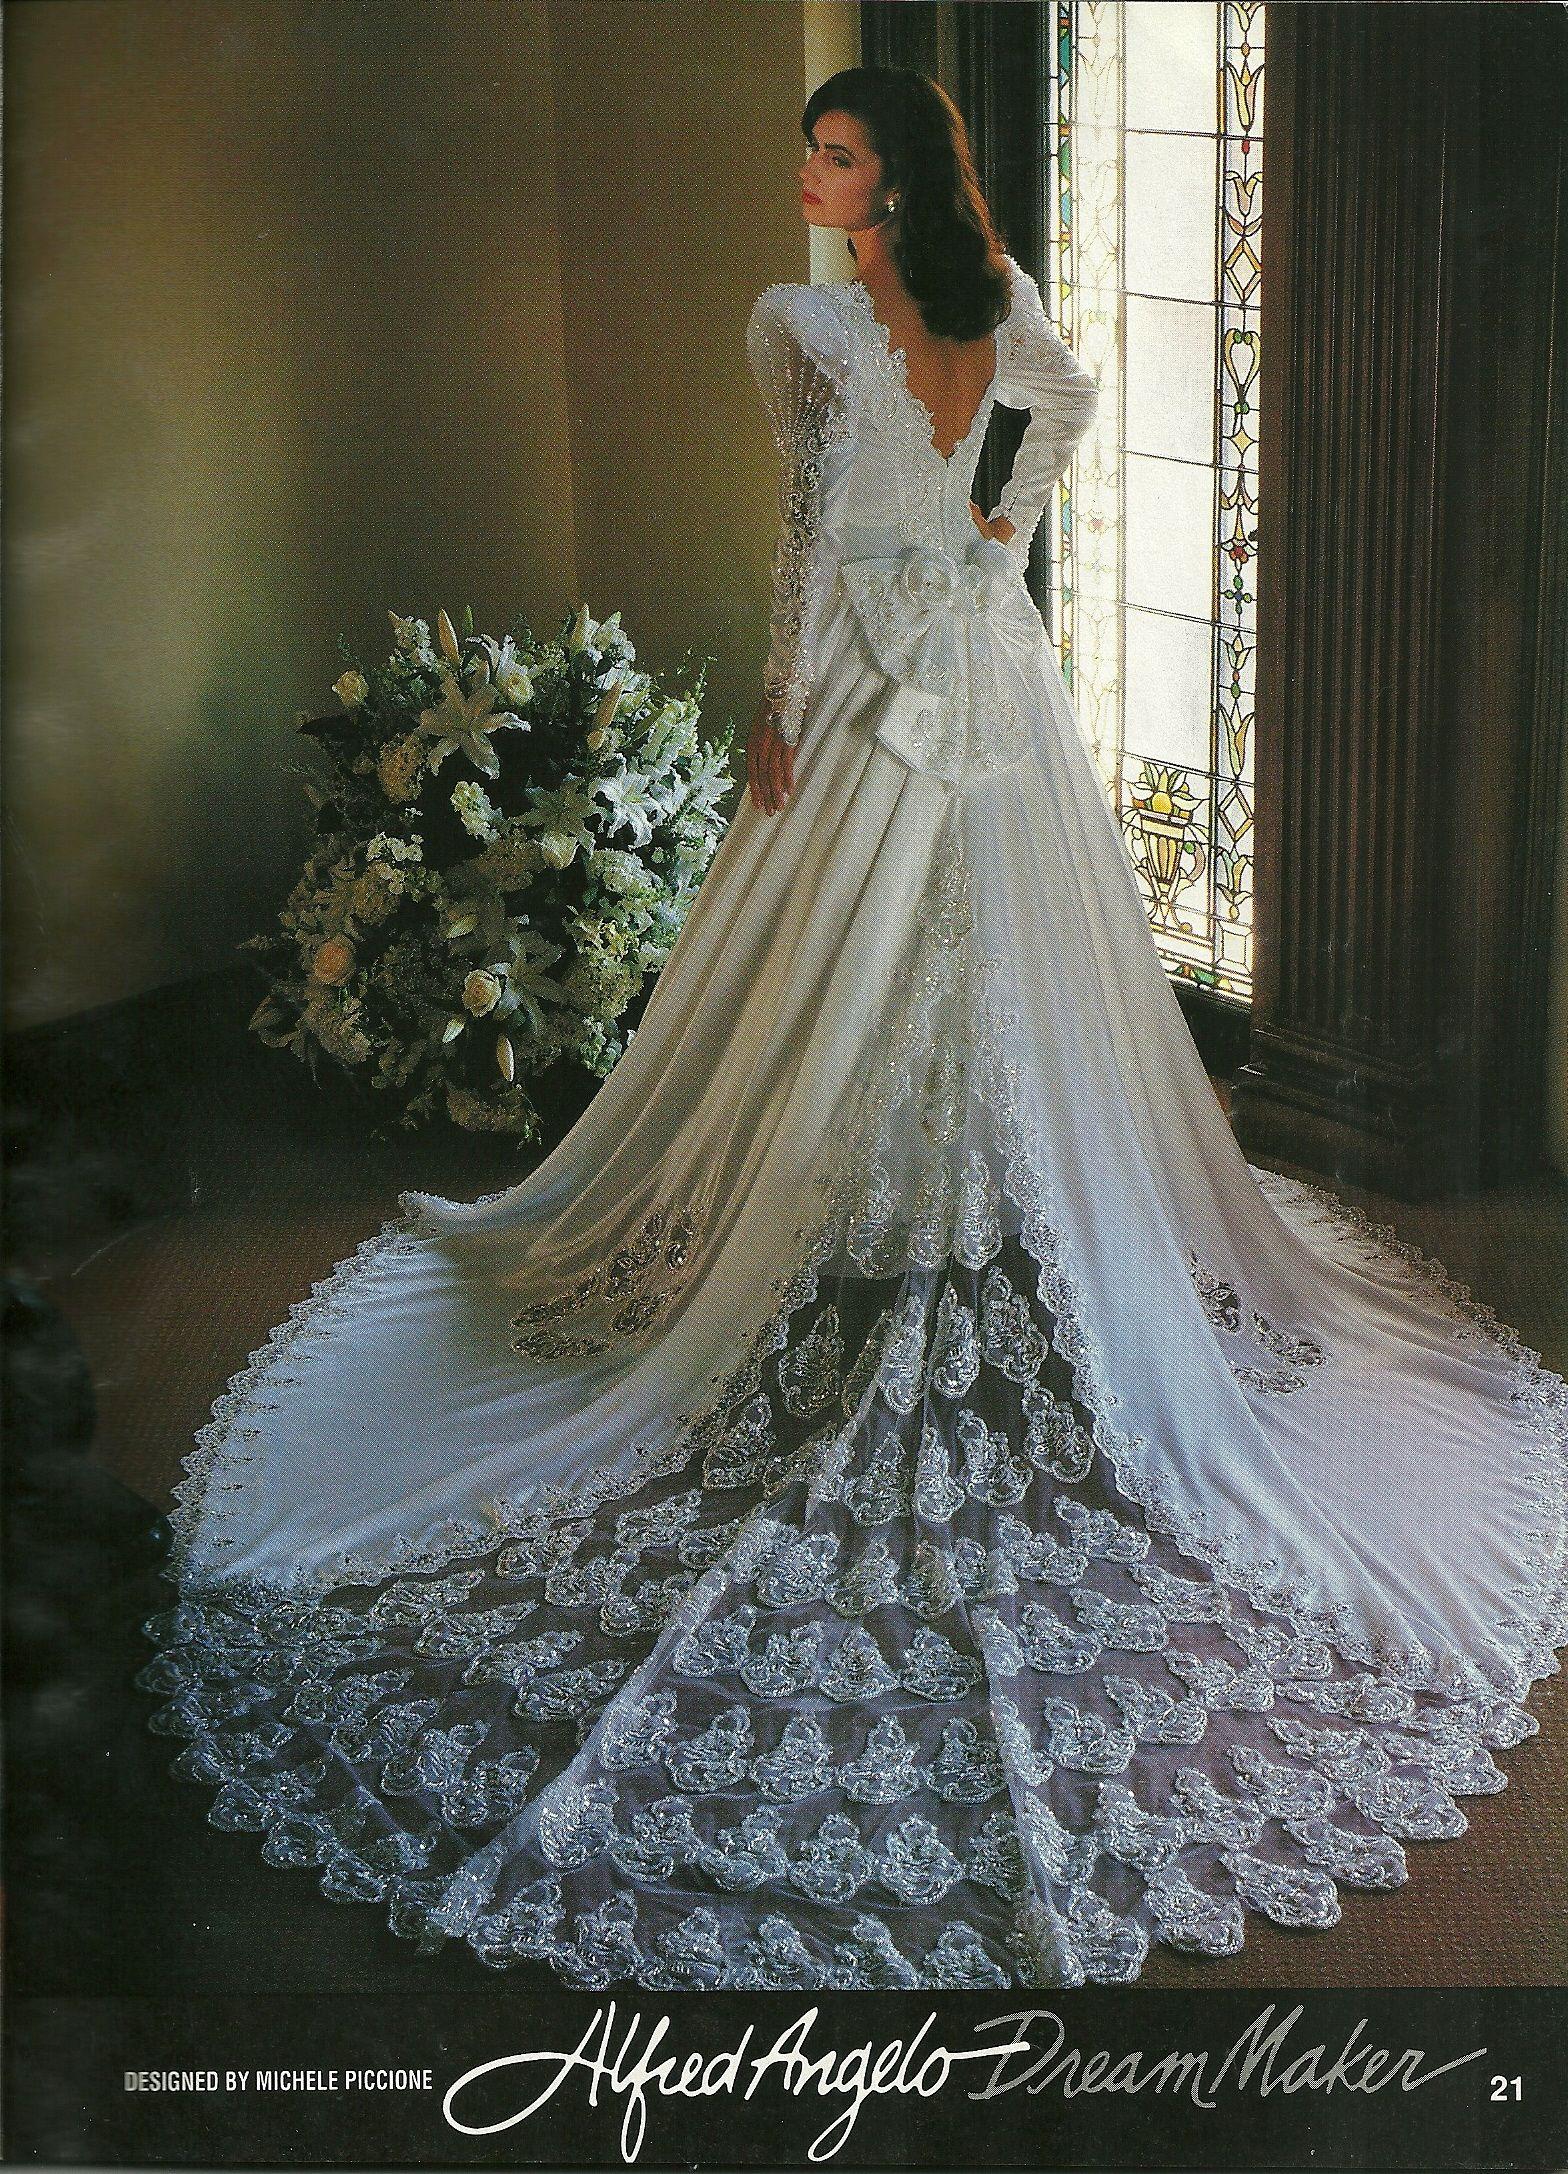 Alfred Angelo Dream Maker Spring Of 1992 Wedding Dress With Veil Dresses